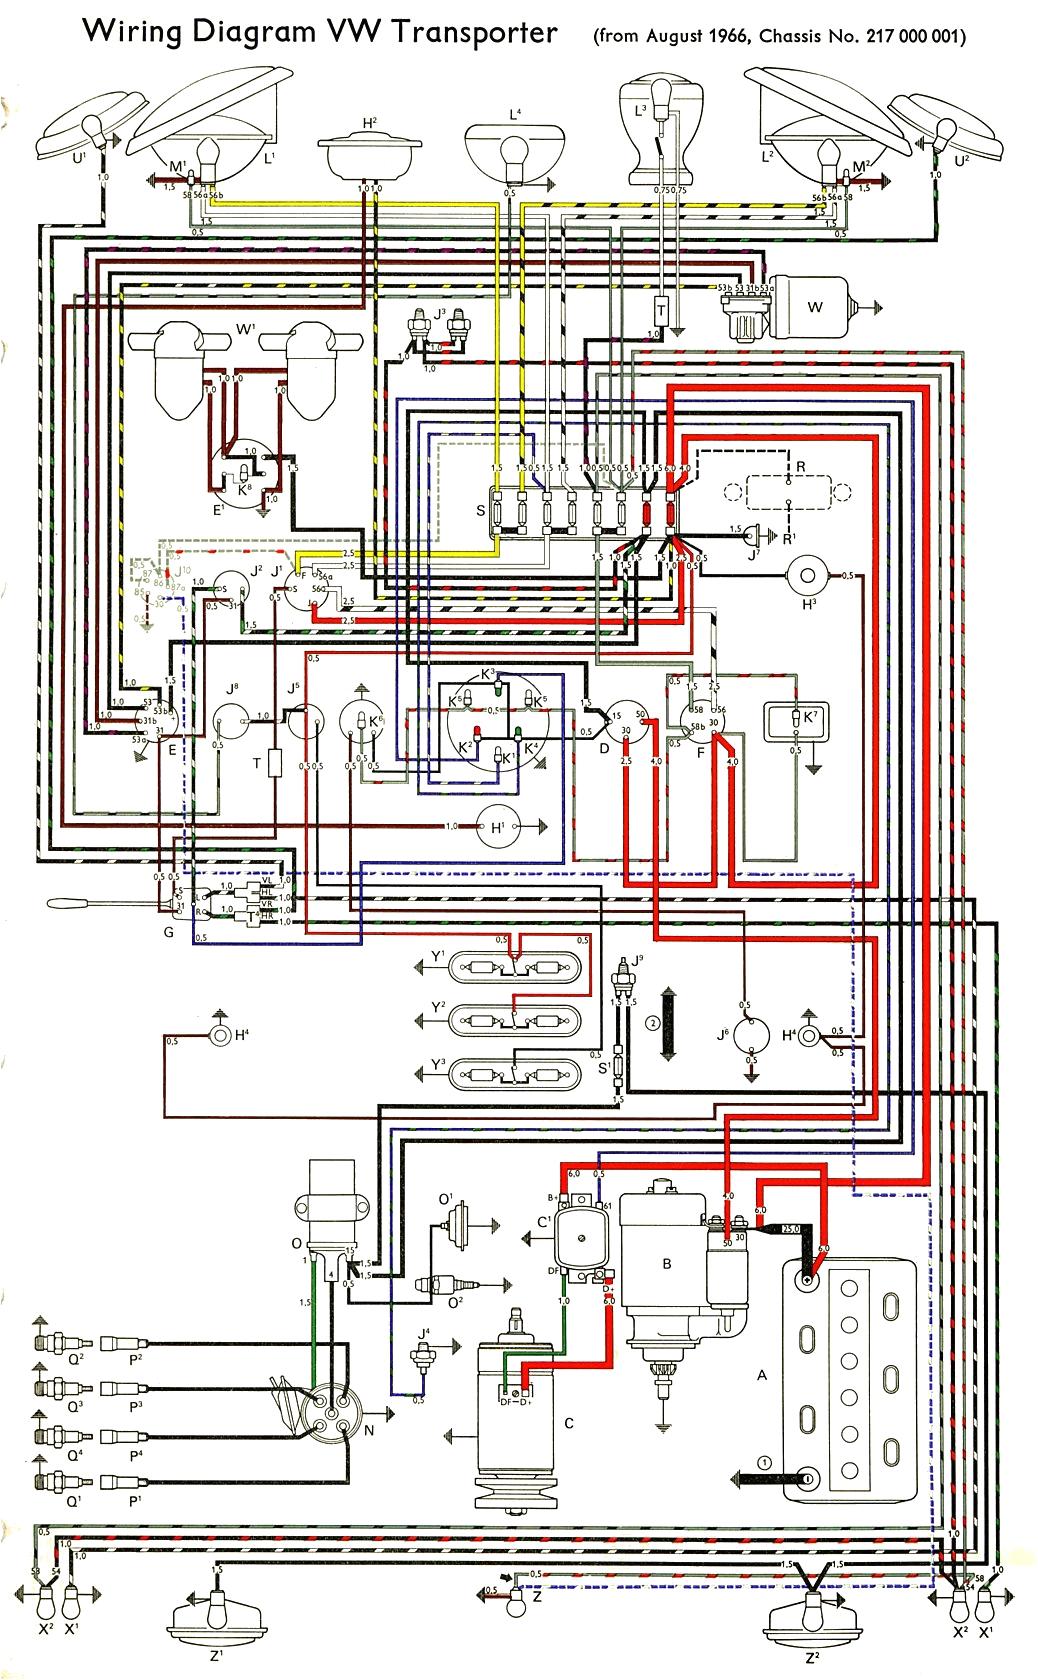 1971 Vw Bus Wiring Diagram 1973 Volkswagen Bus Fuse Box My Wiring Diagram